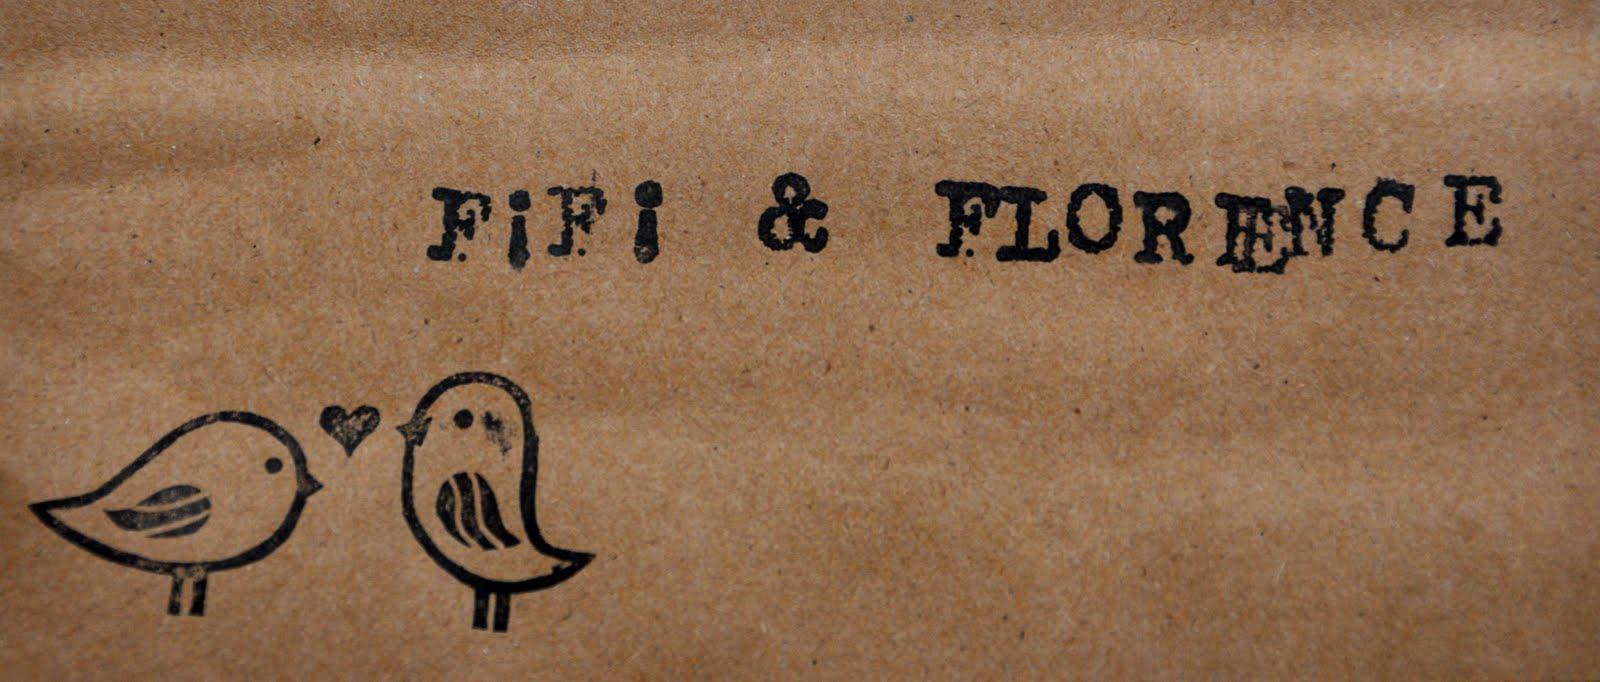 Fifi & Florence